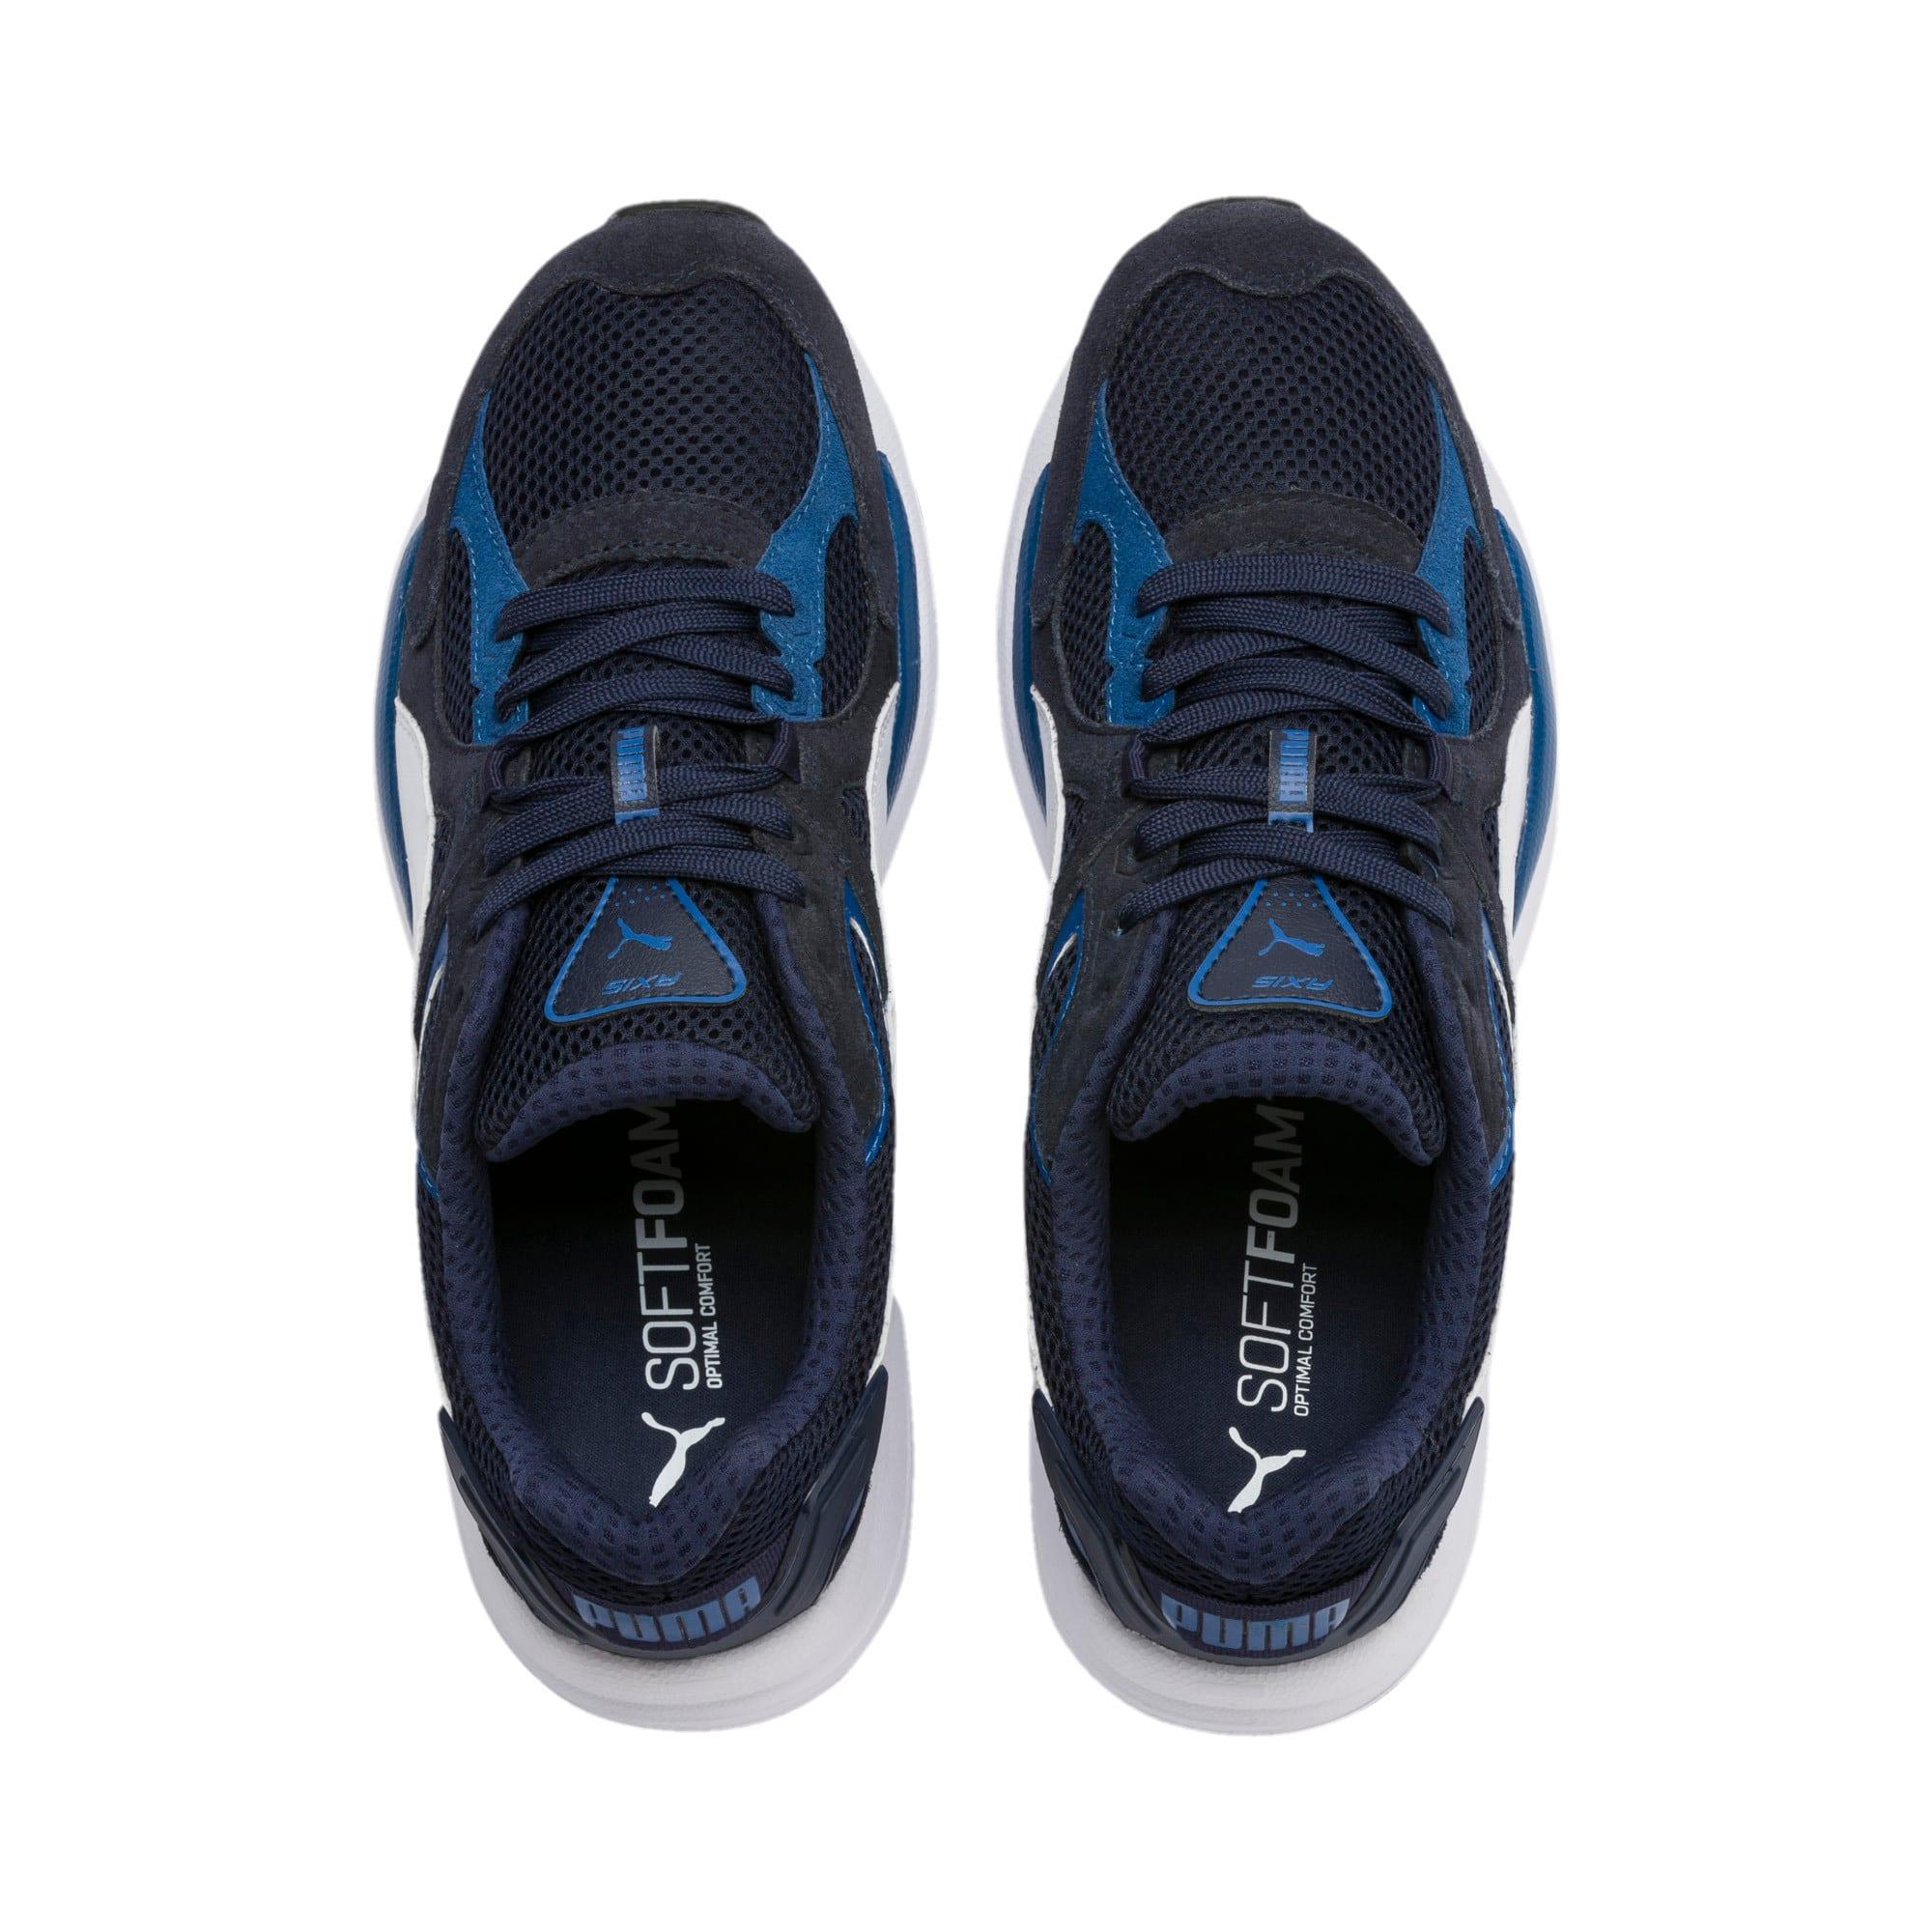 Miniatura 7 de Zapatos deportivos Axis Plus Suede, Peacoat-G Blue-White-Black, mediano